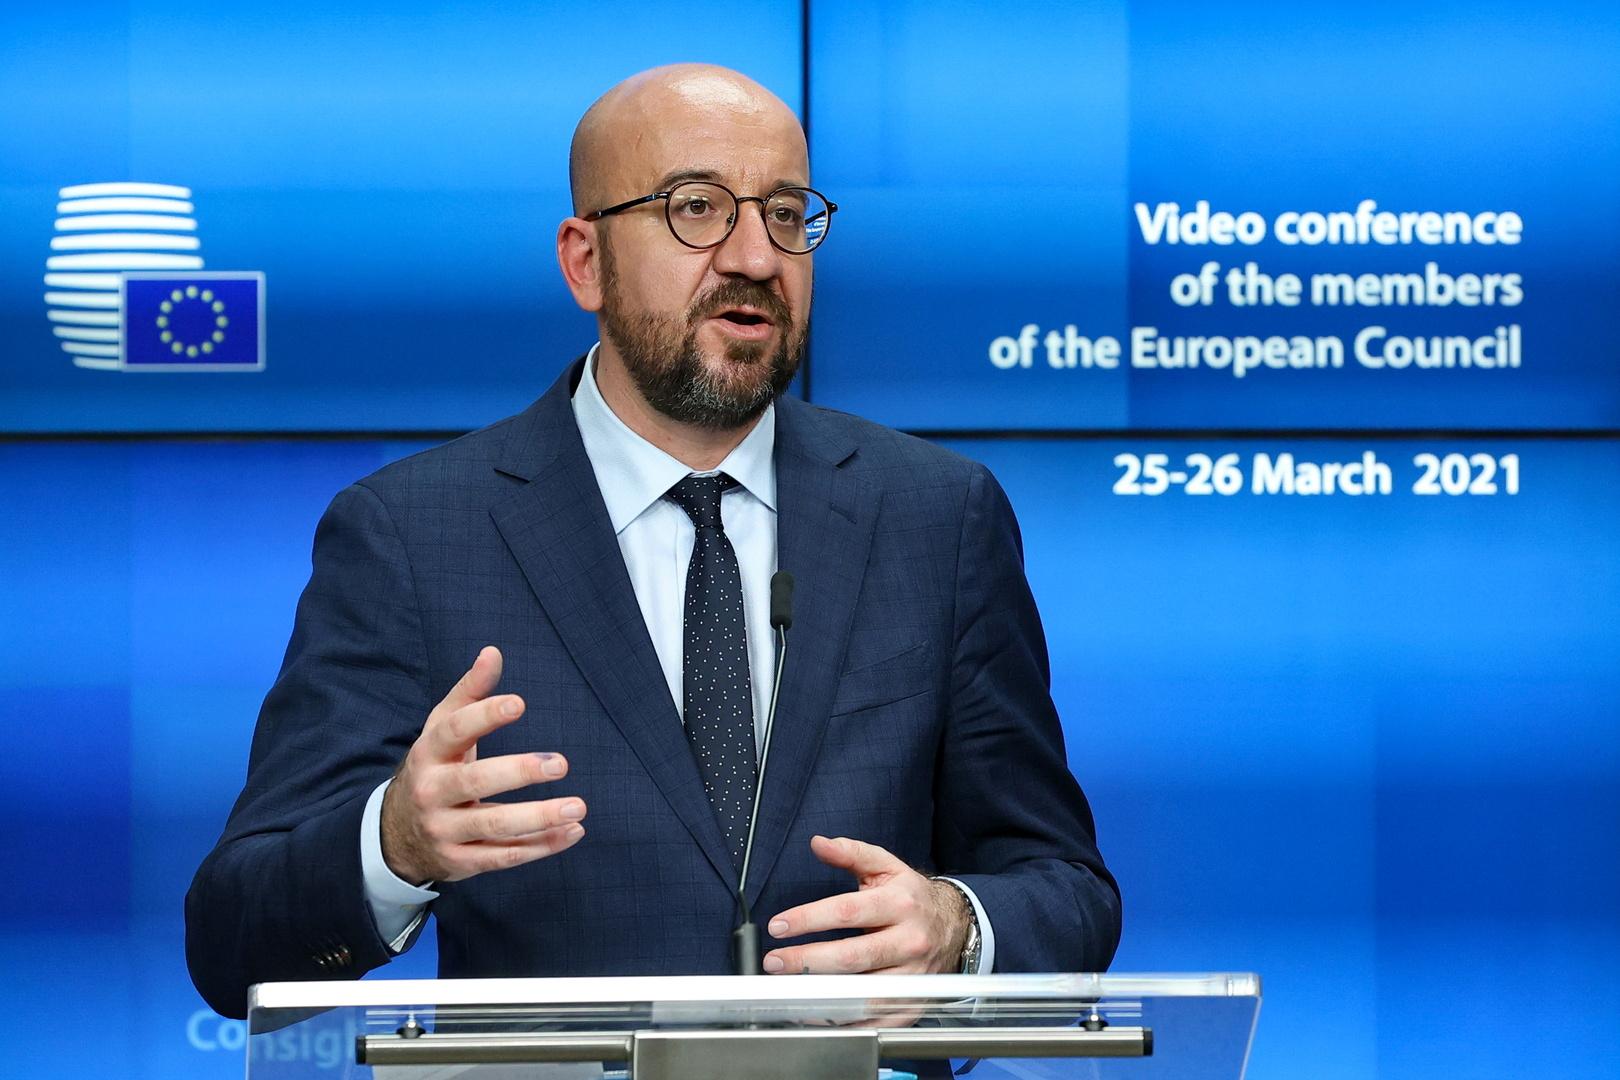 European Union: Turkey should stick to its moderate behavior